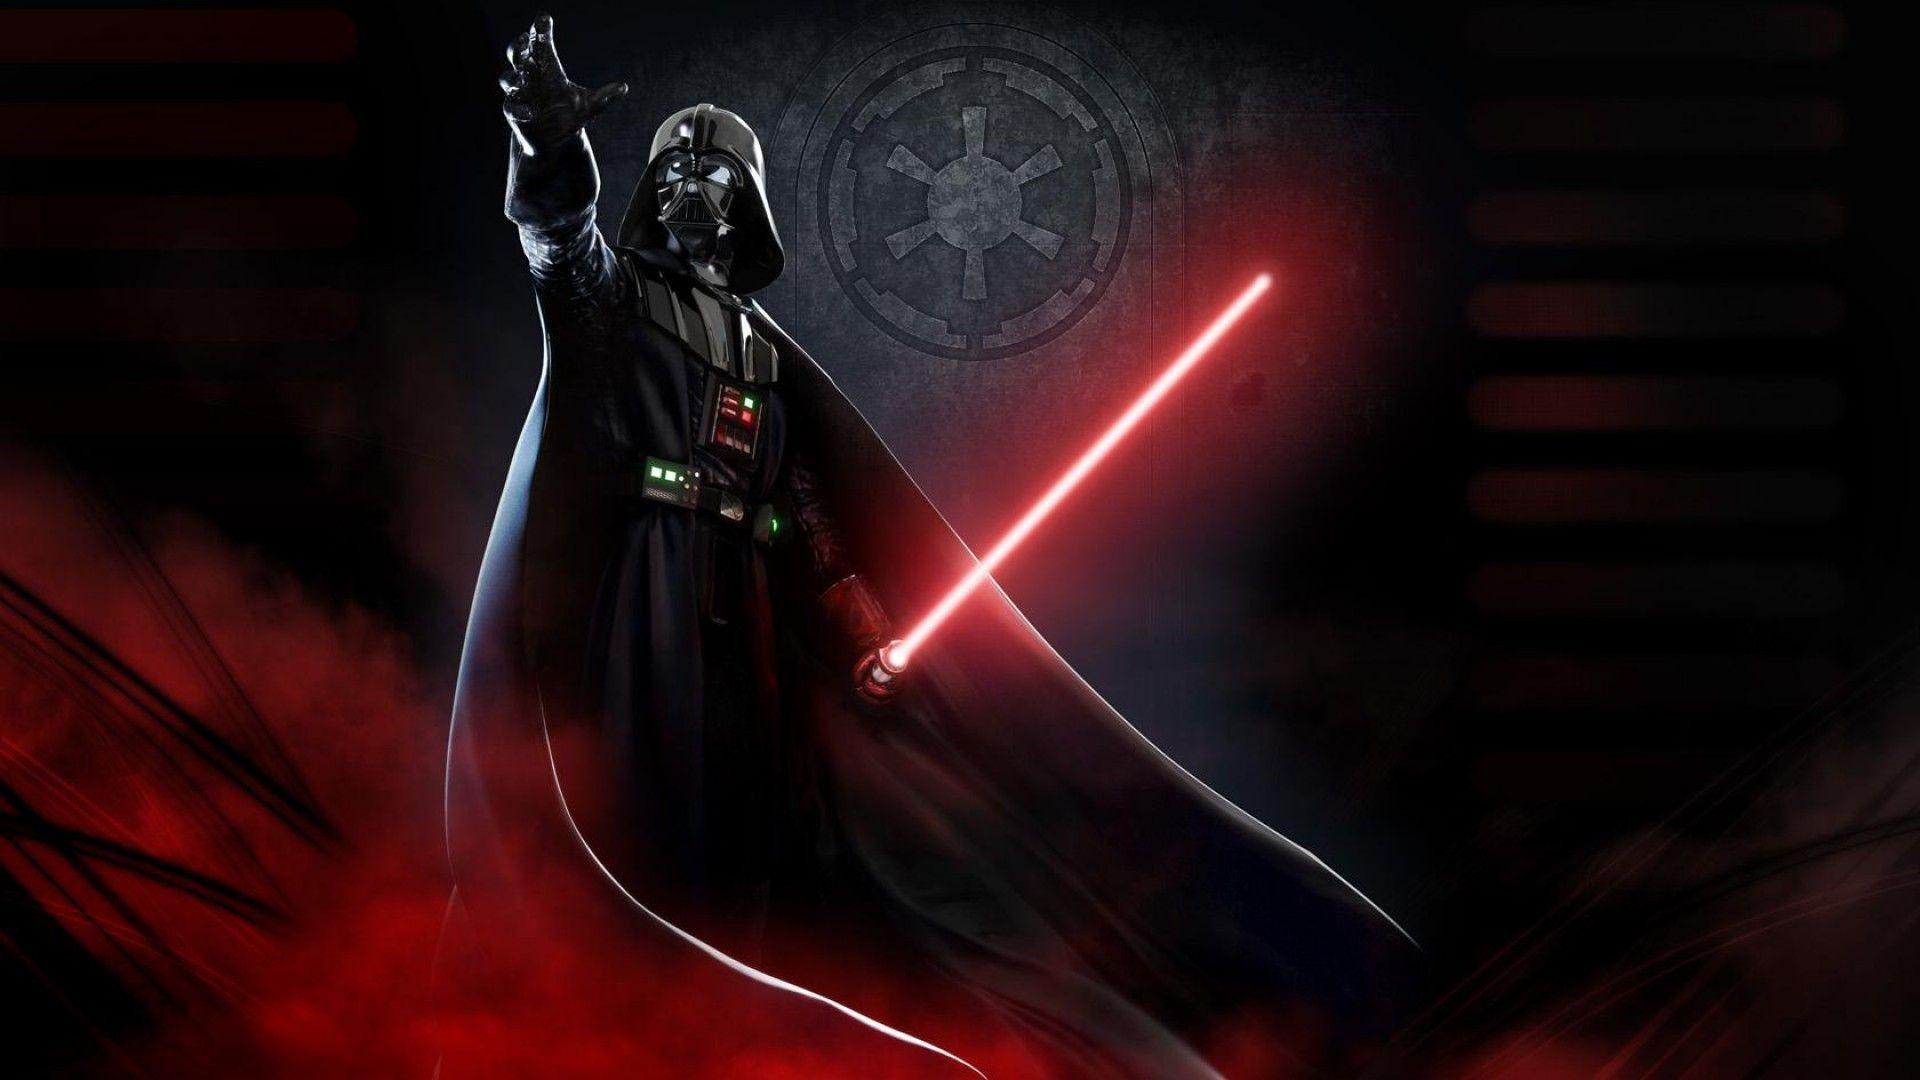 Res: 1920x1080, Star Wars Sith wallpaper